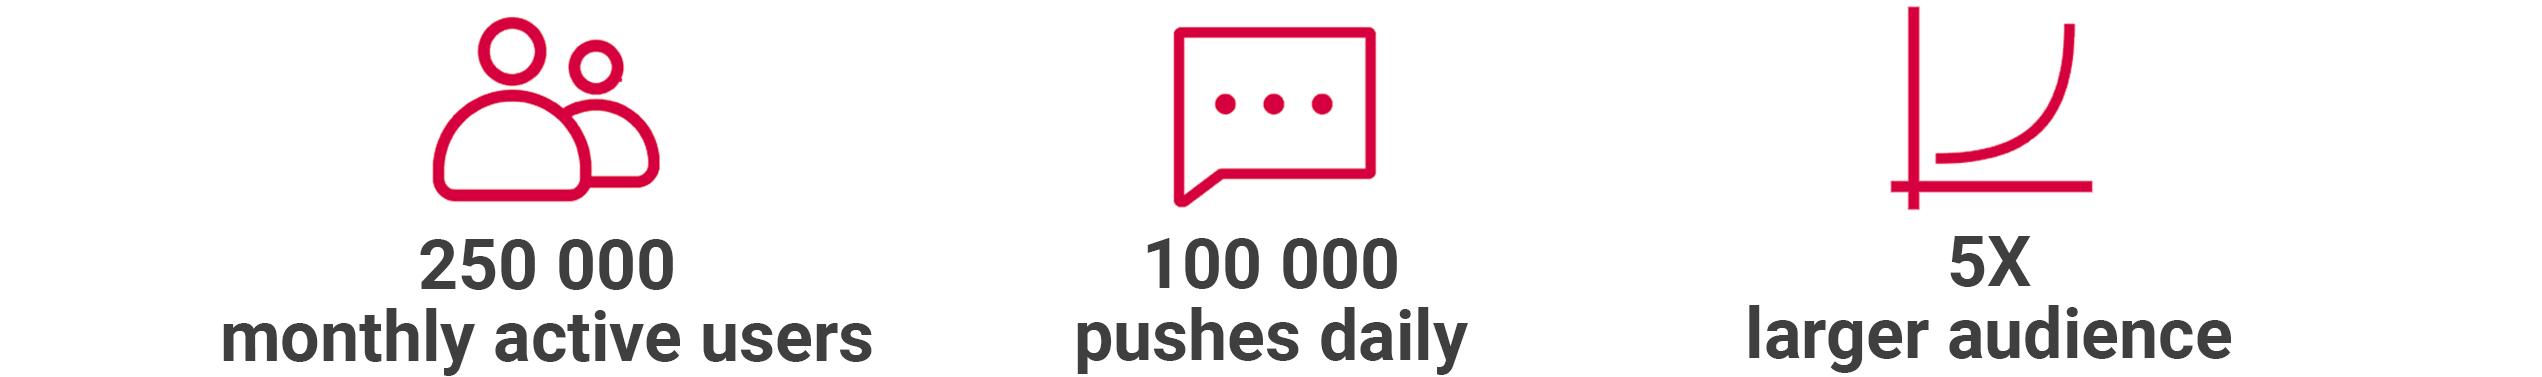 LifeMiles success story Pushwoosh